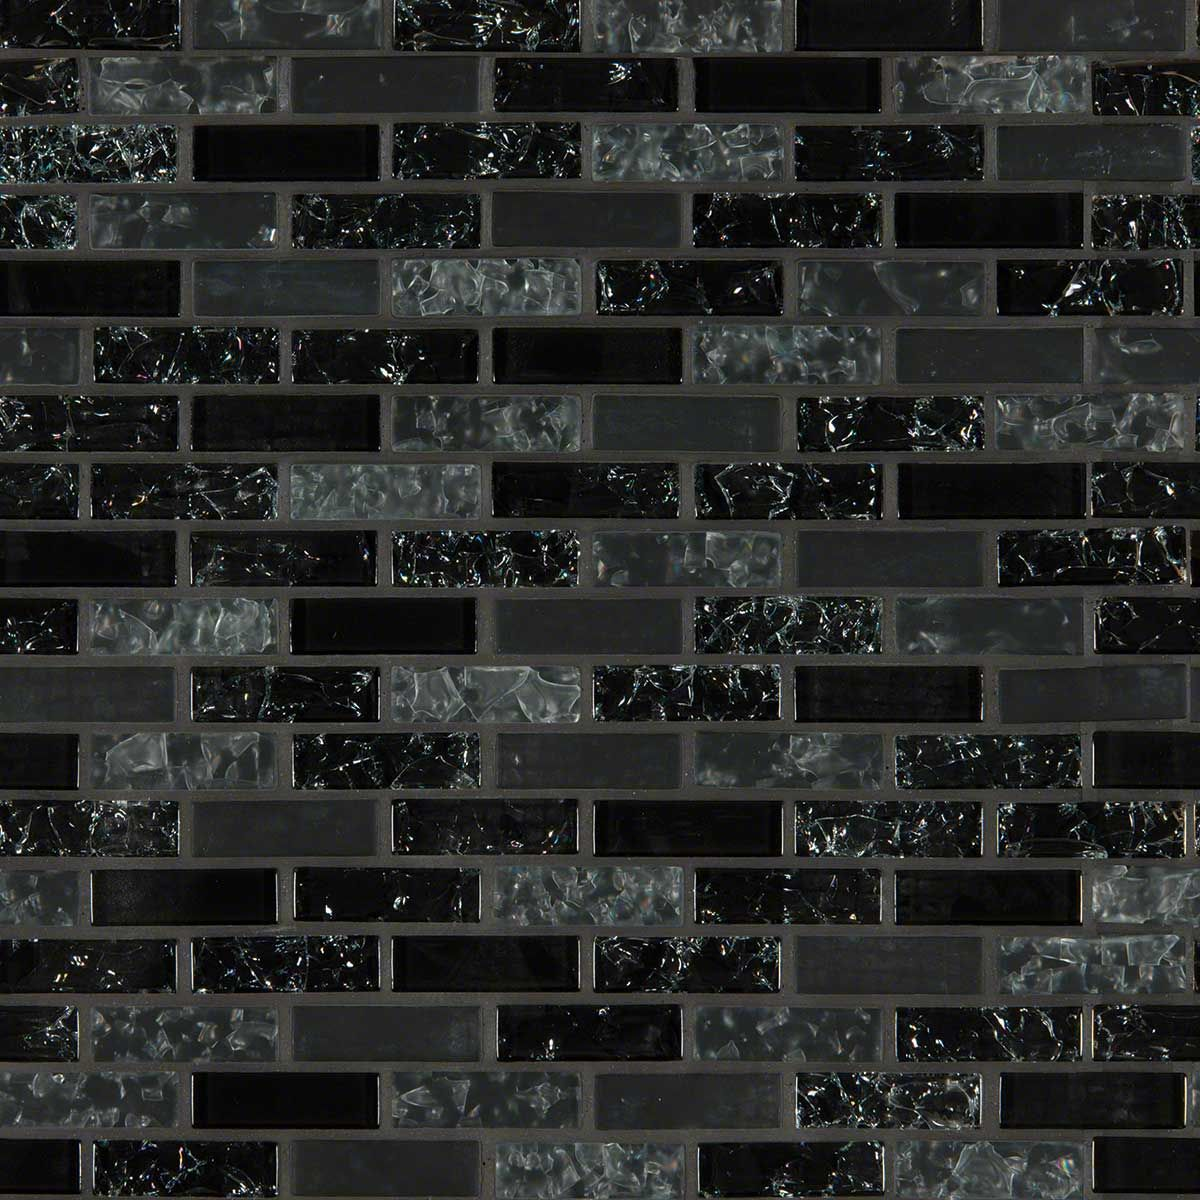 Glissen 8 8x2x6mm Mosaics Black Mosaic Tile Glass Mosaic Tiles Mosaic Glass